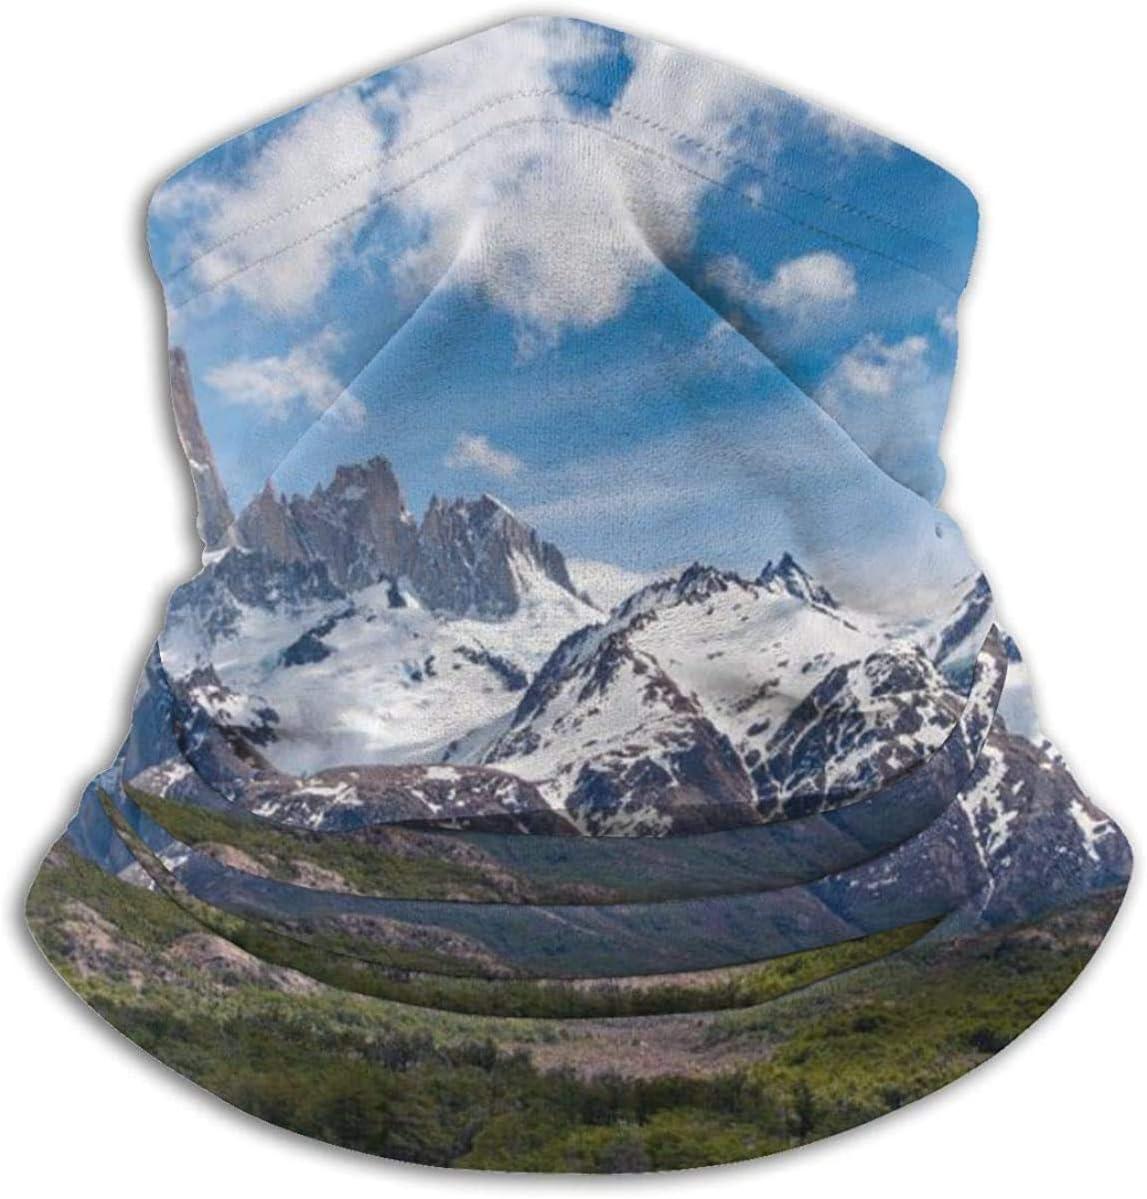 Lastbest Fitz Roy Mountain Neck Warmer Multifunction Scarf Hat Neck Gaiter Neck Cap Bala Windproof Neck Heating Wrap Outdoor Sports One Size